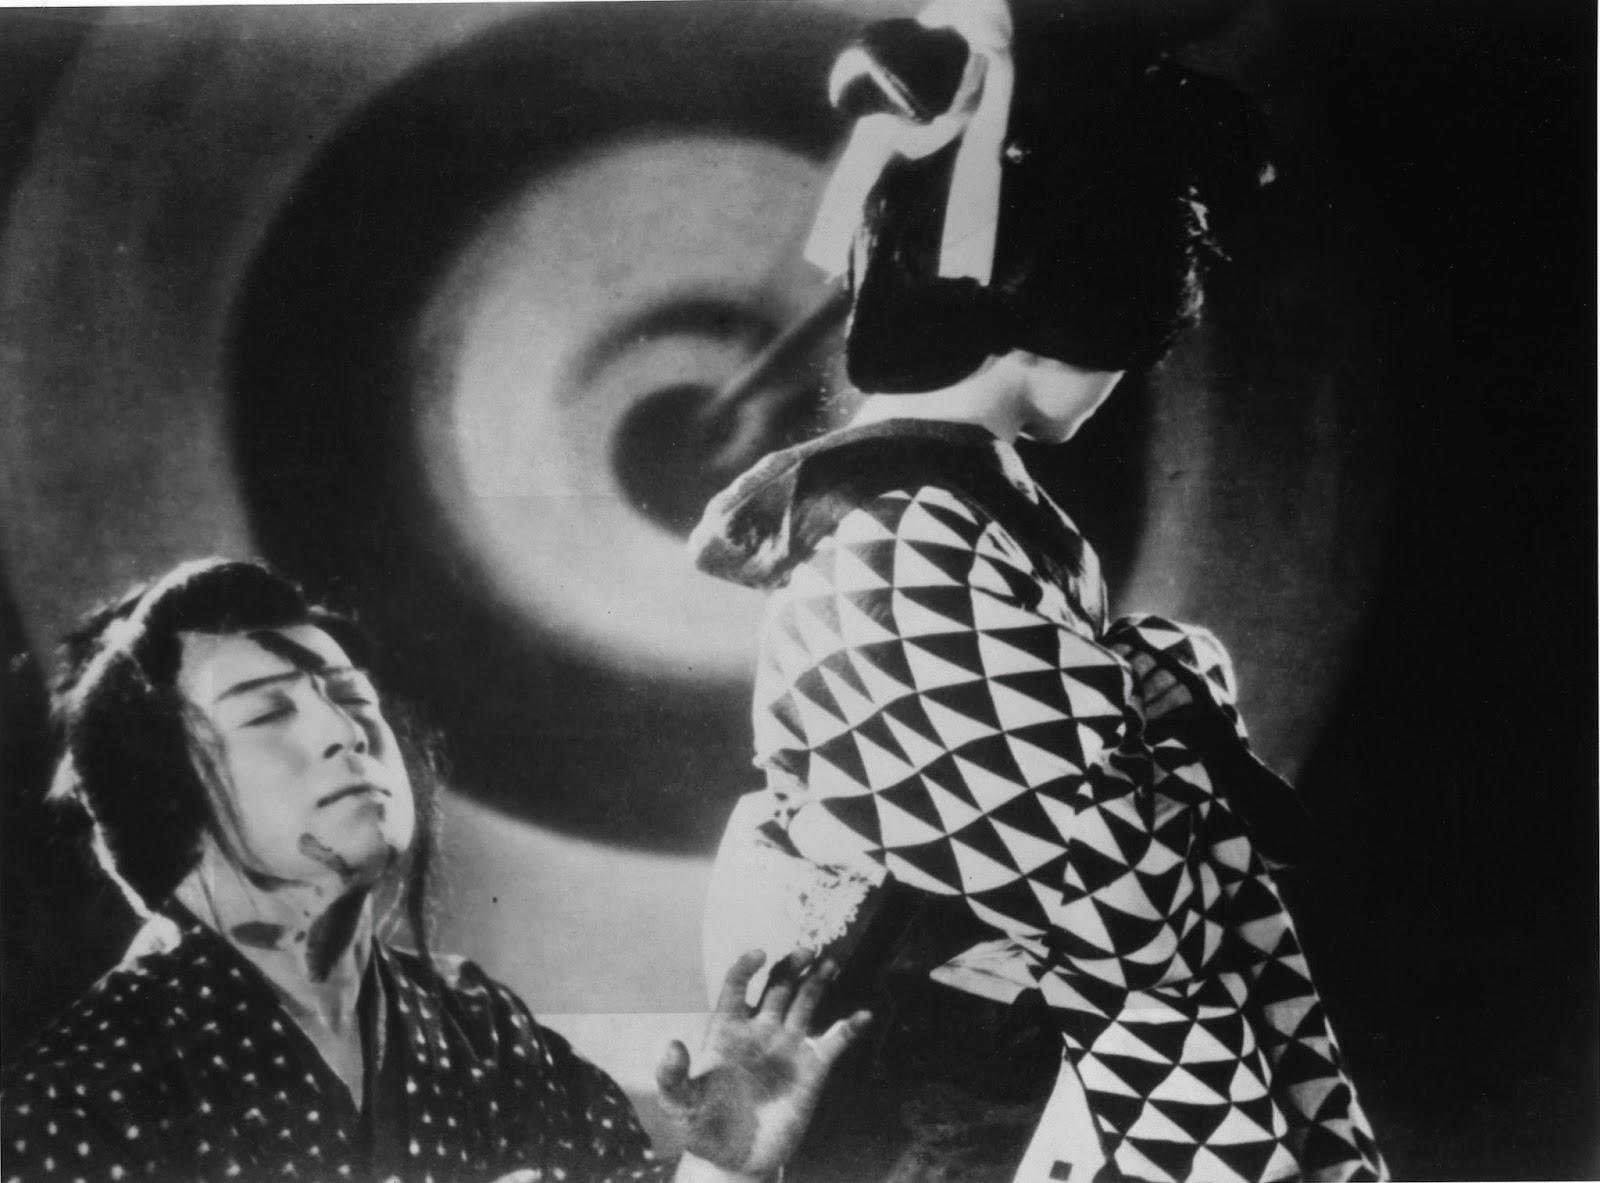 Teinosuke Kinugasa's Crossroads (1928)